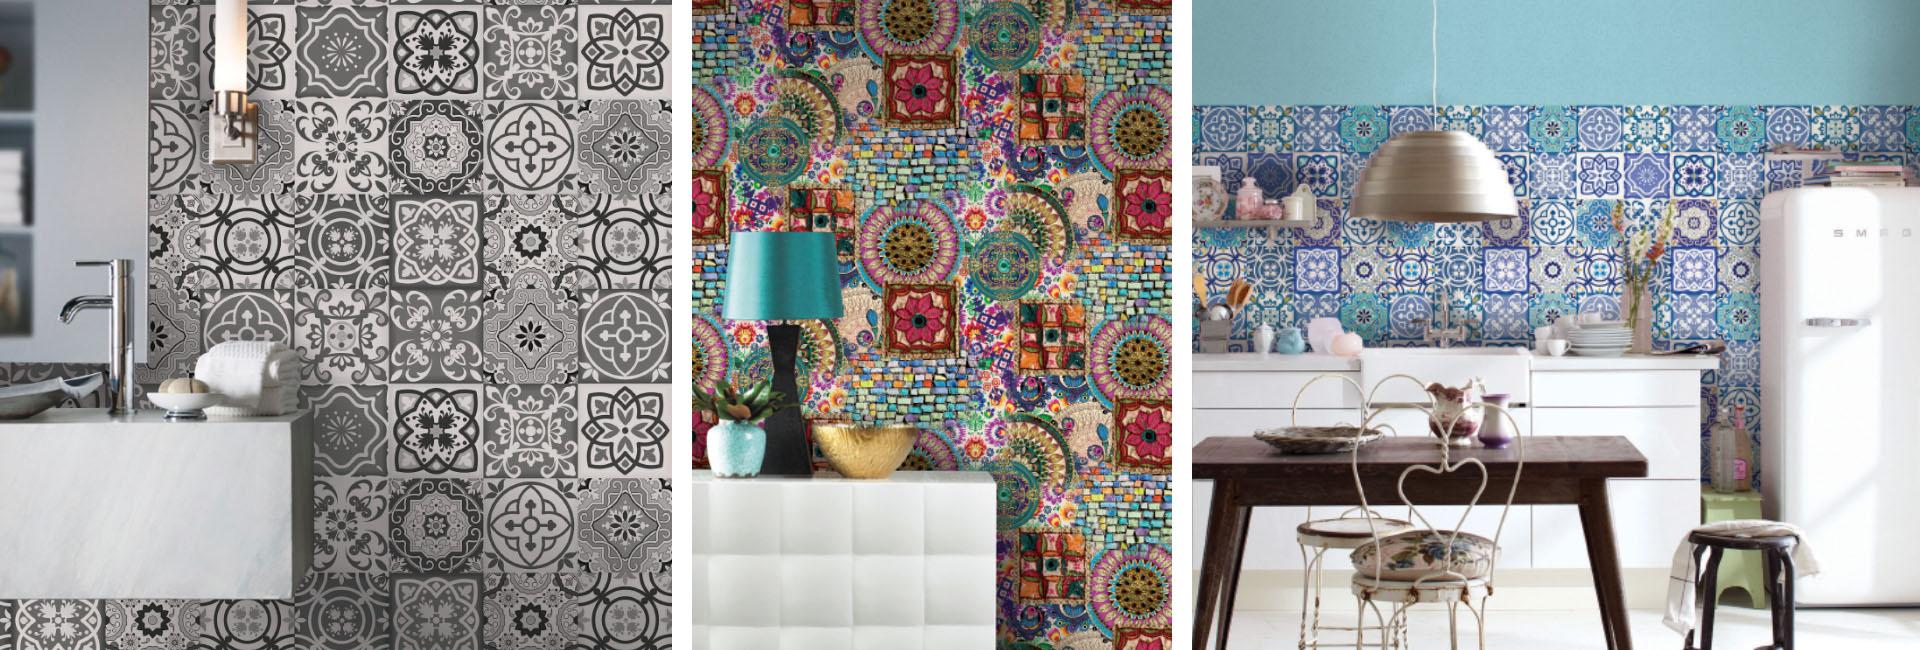 Empapelados vin licos decoral alfombras papeles for Papeles pintados vinilicos